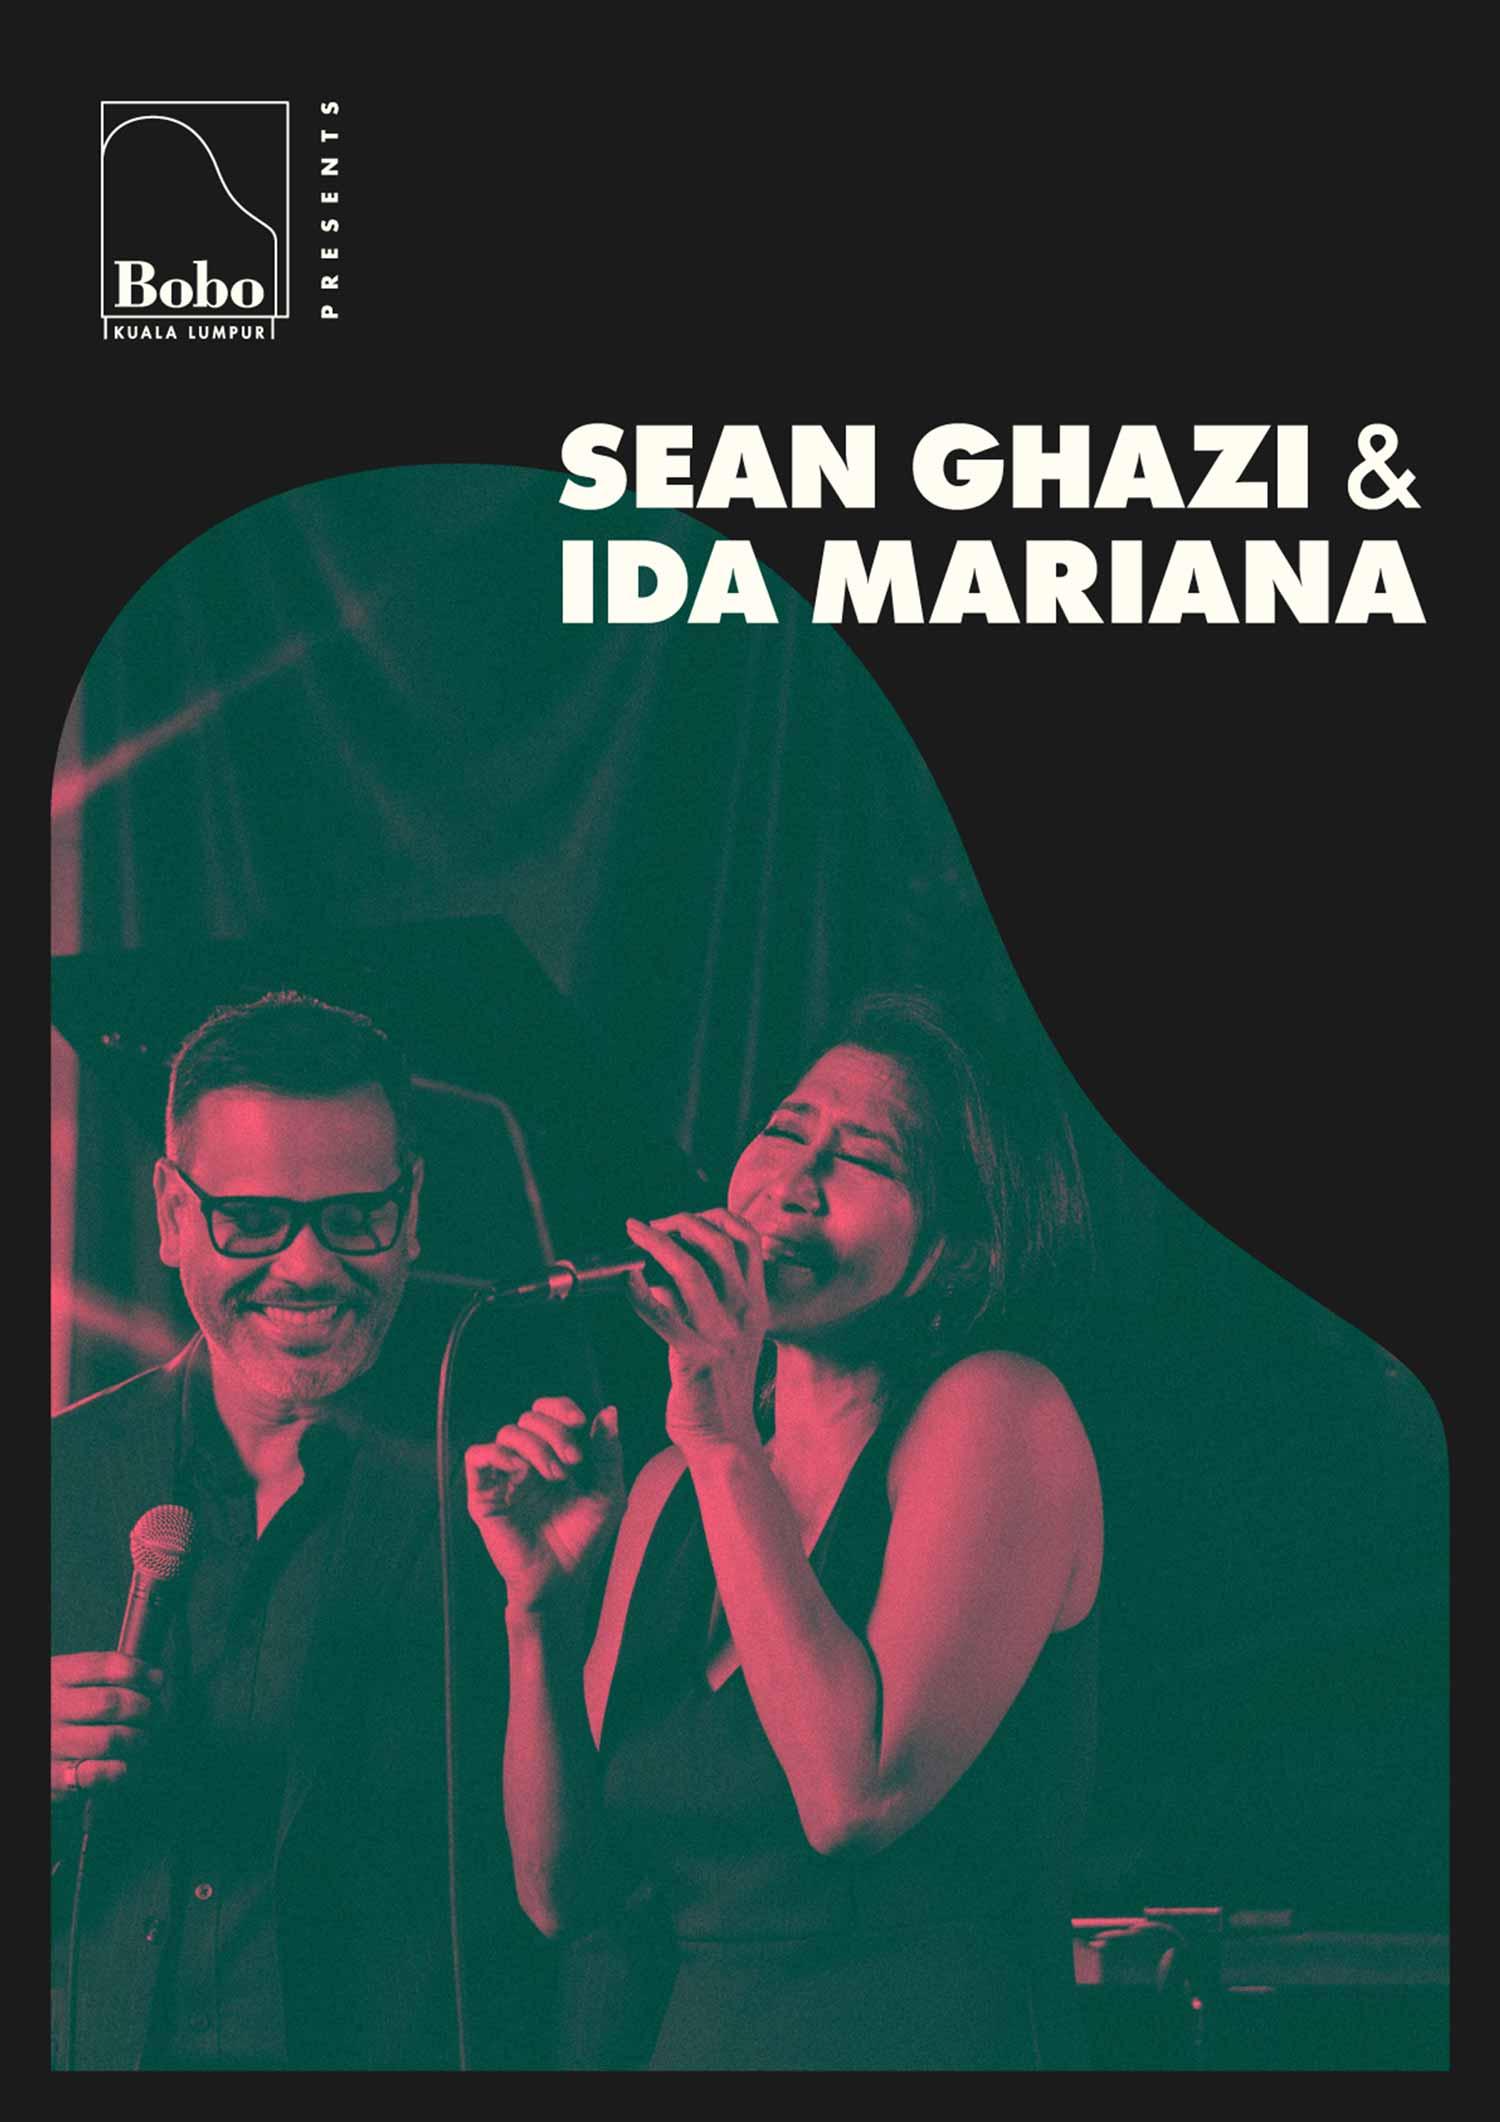 Sean Ghazi & Ida Mariana